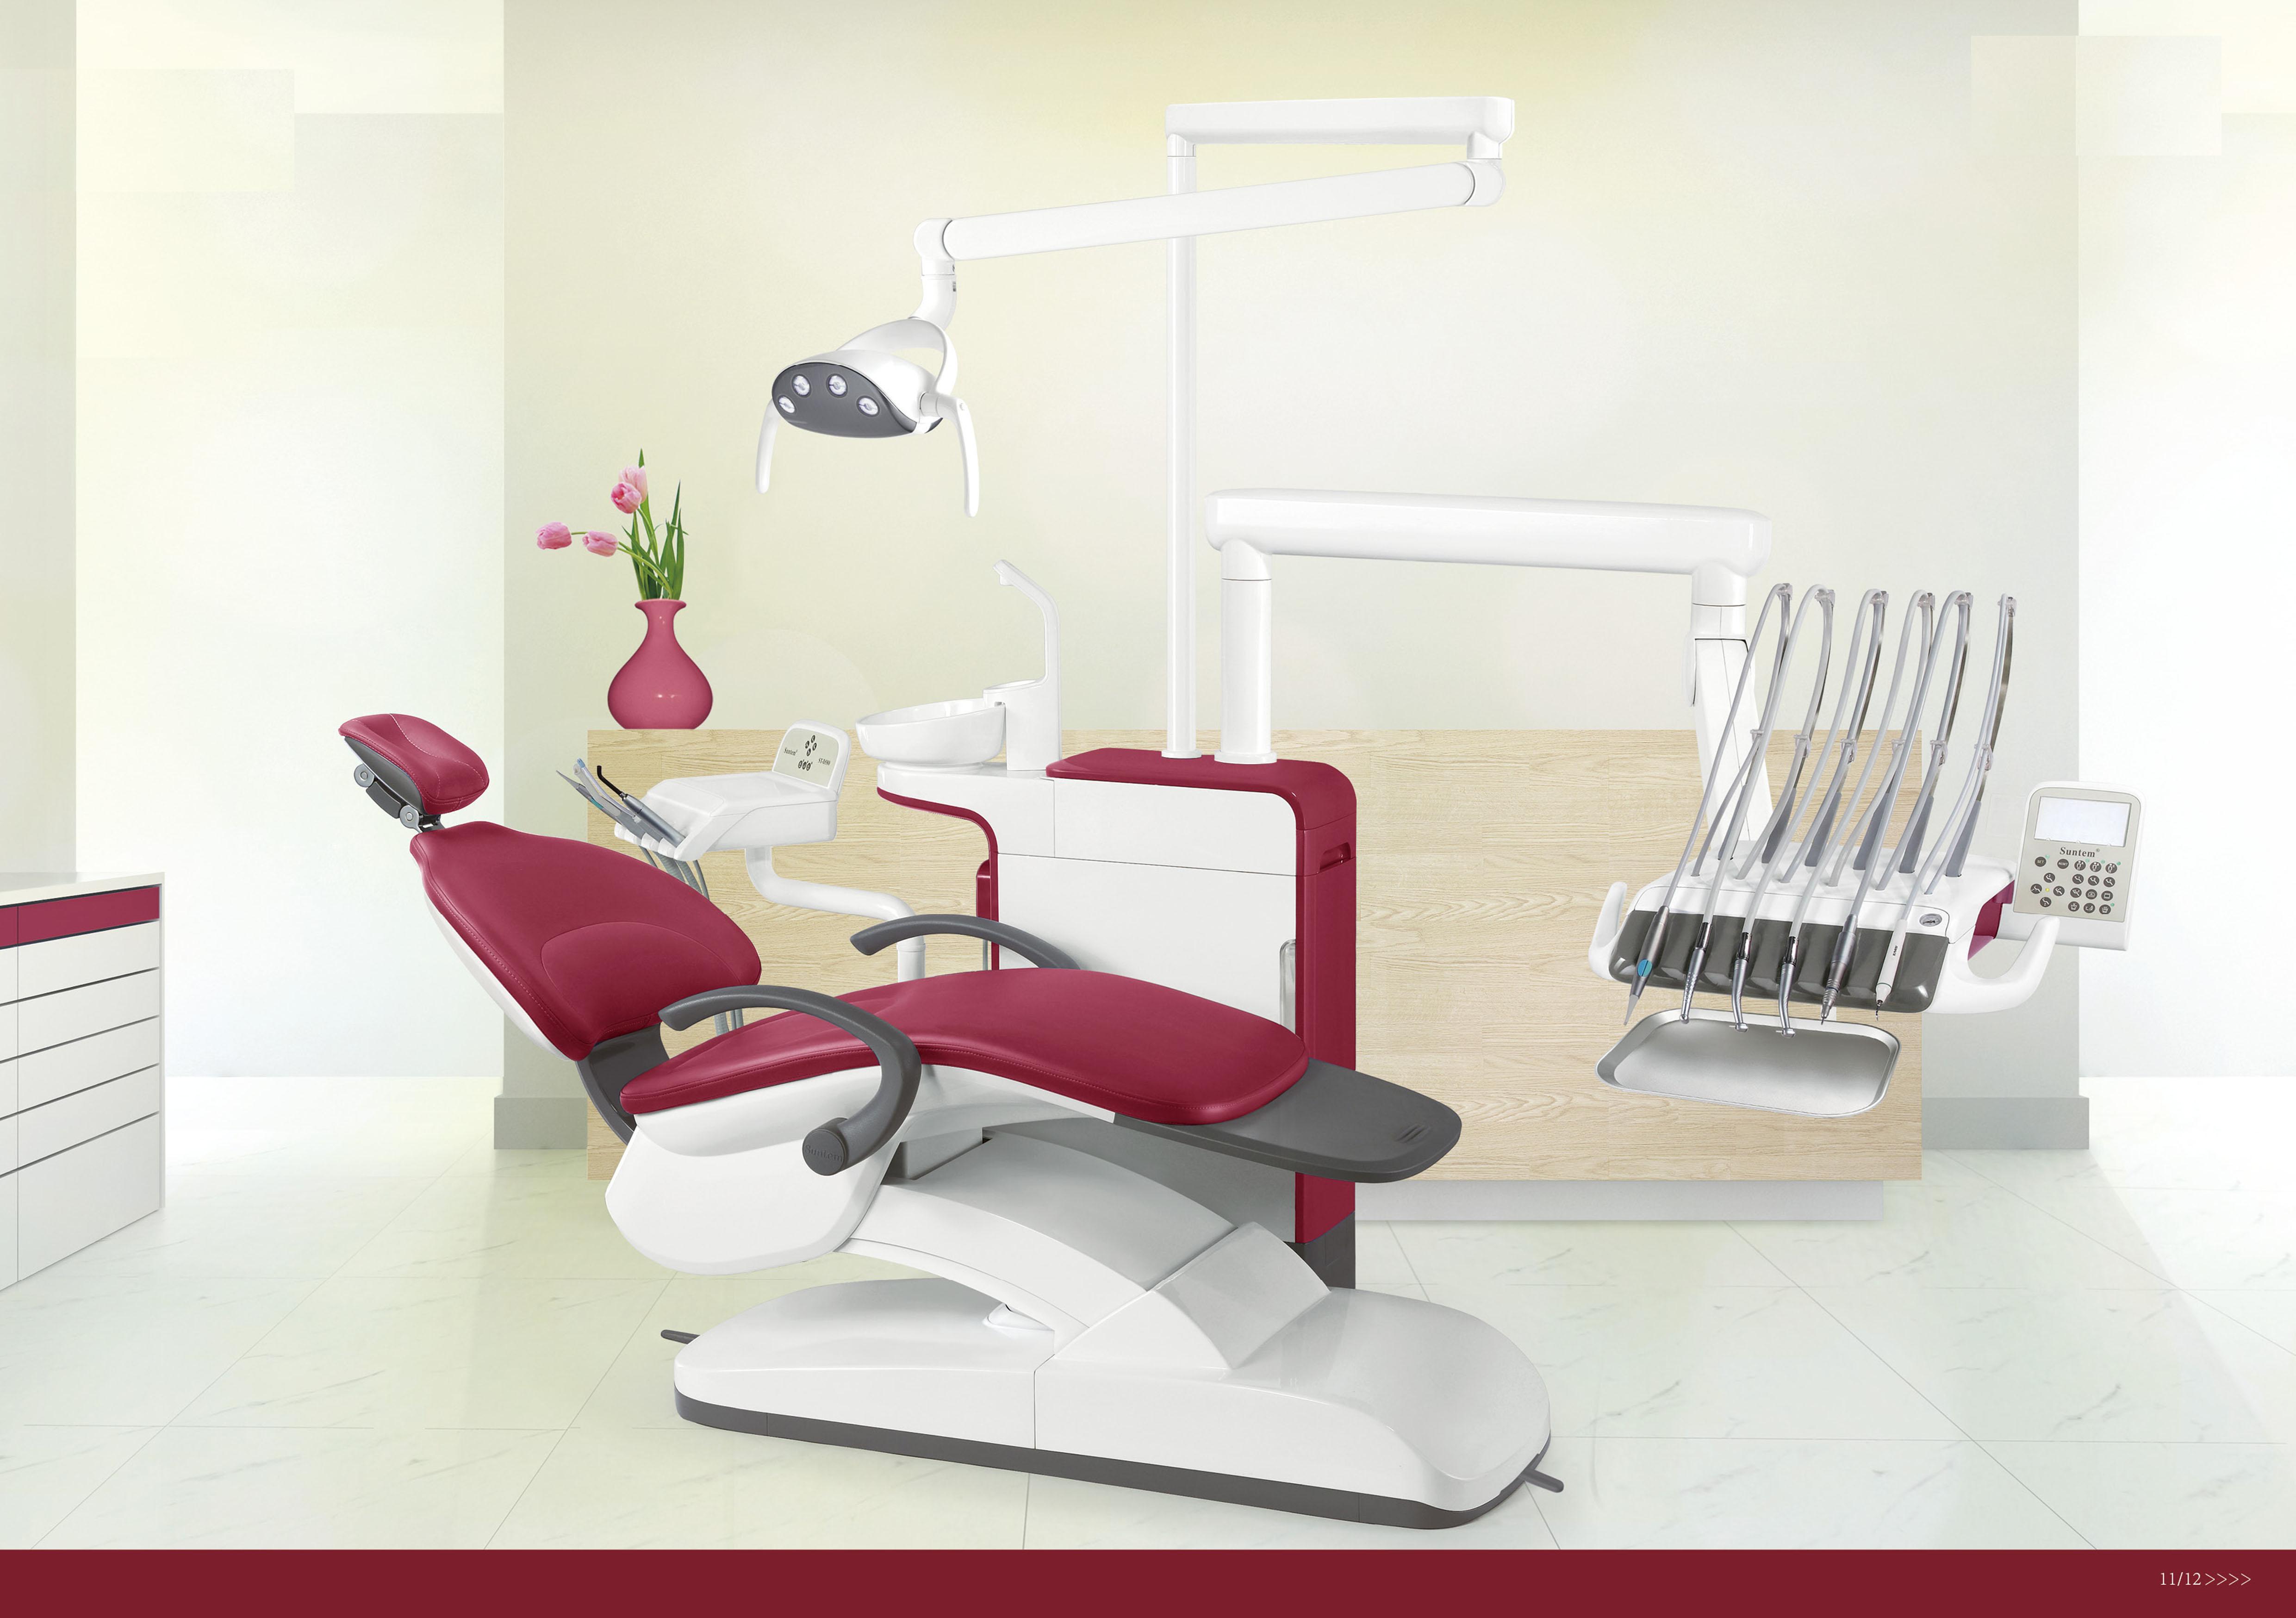 Confident Dental Chair Price List Treedental Blog